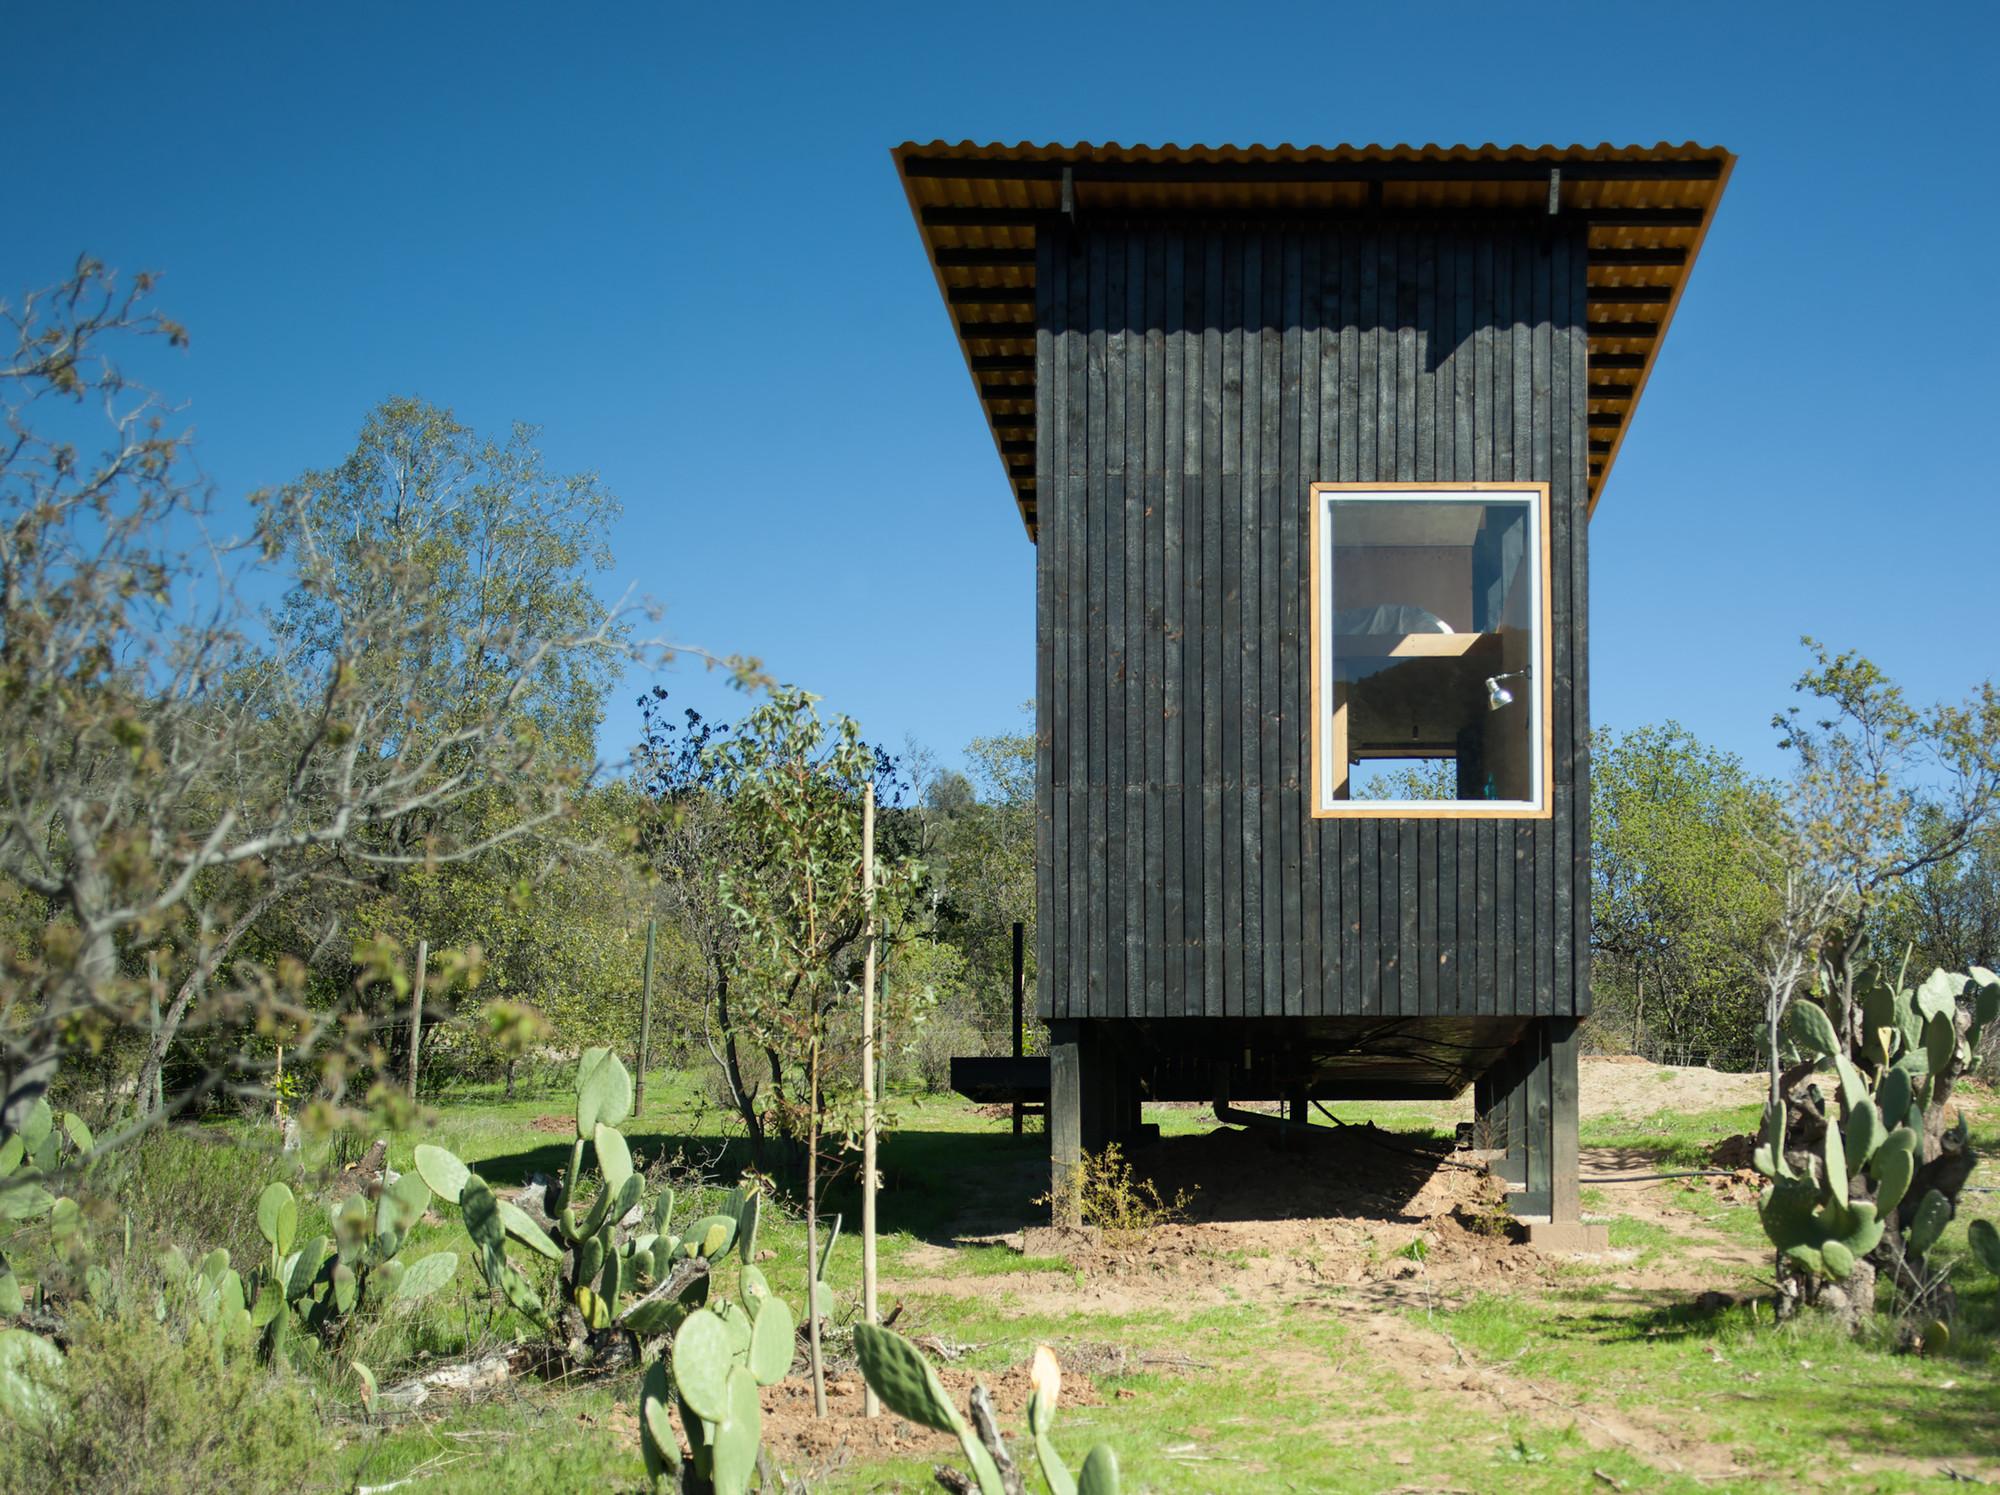 Charred Cabin / DRAA, Courtesy of Felipe Camus